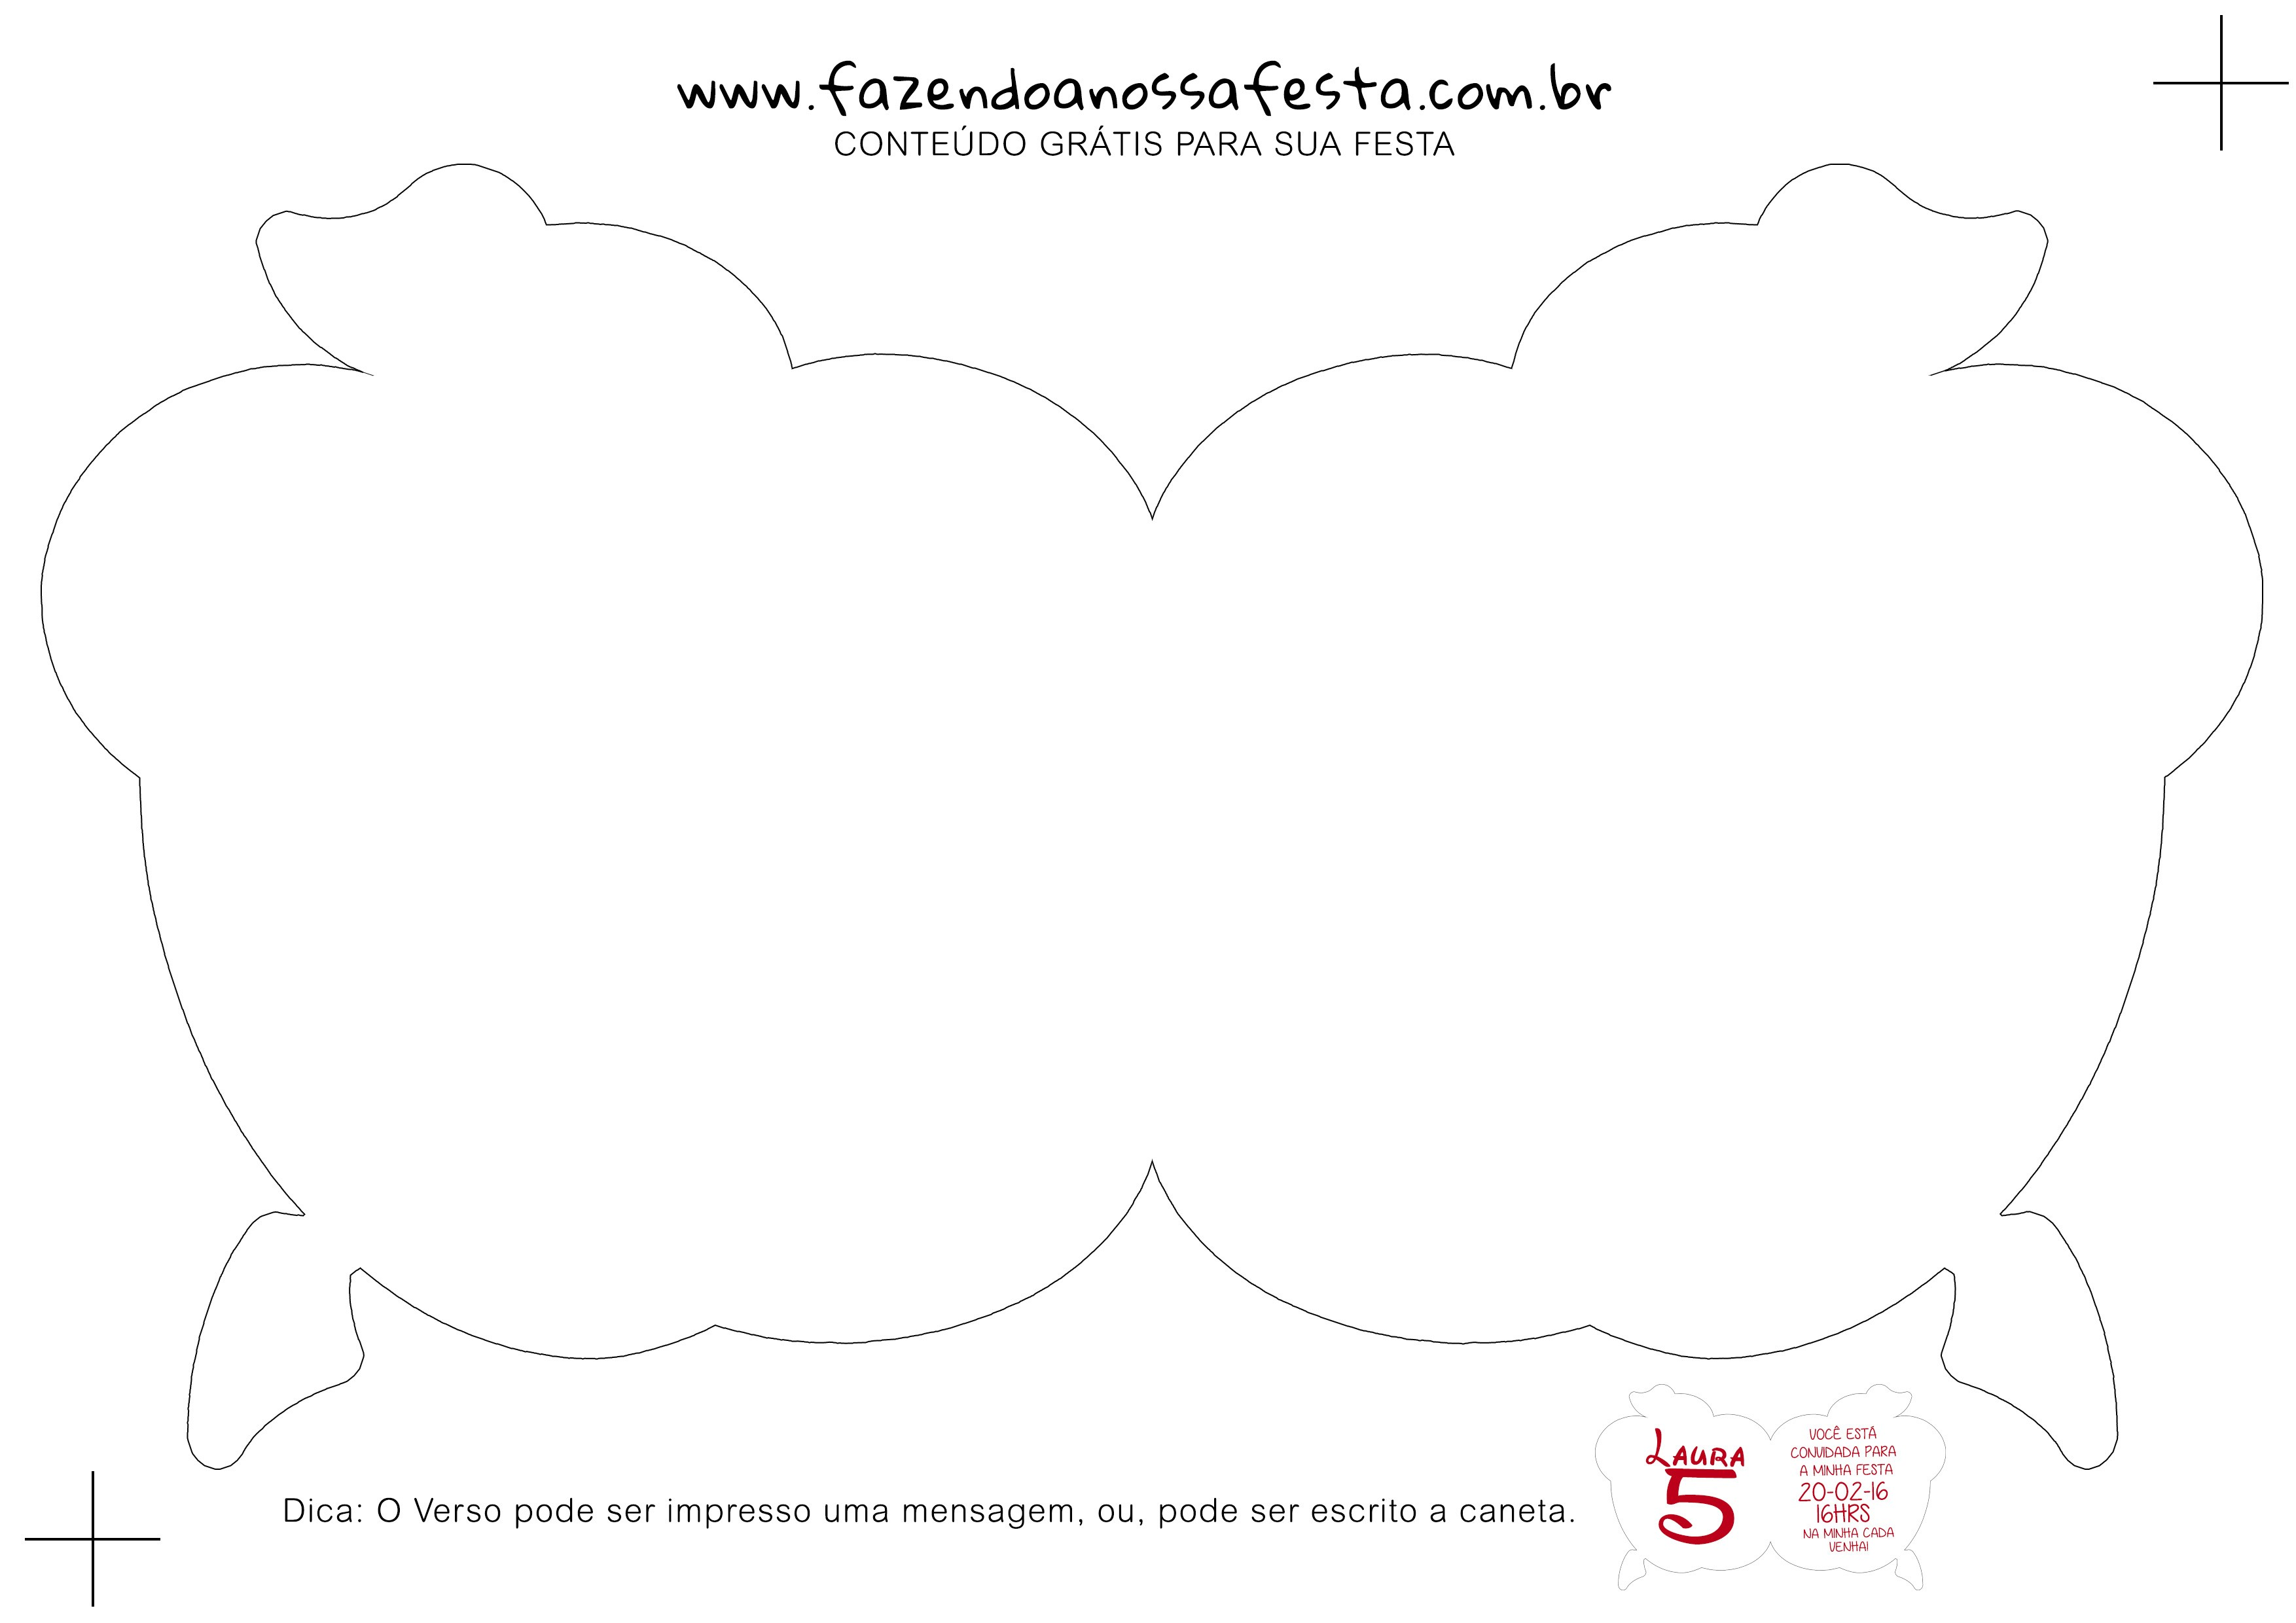 Convite Descentes Dobrável estilo Maça - Verso